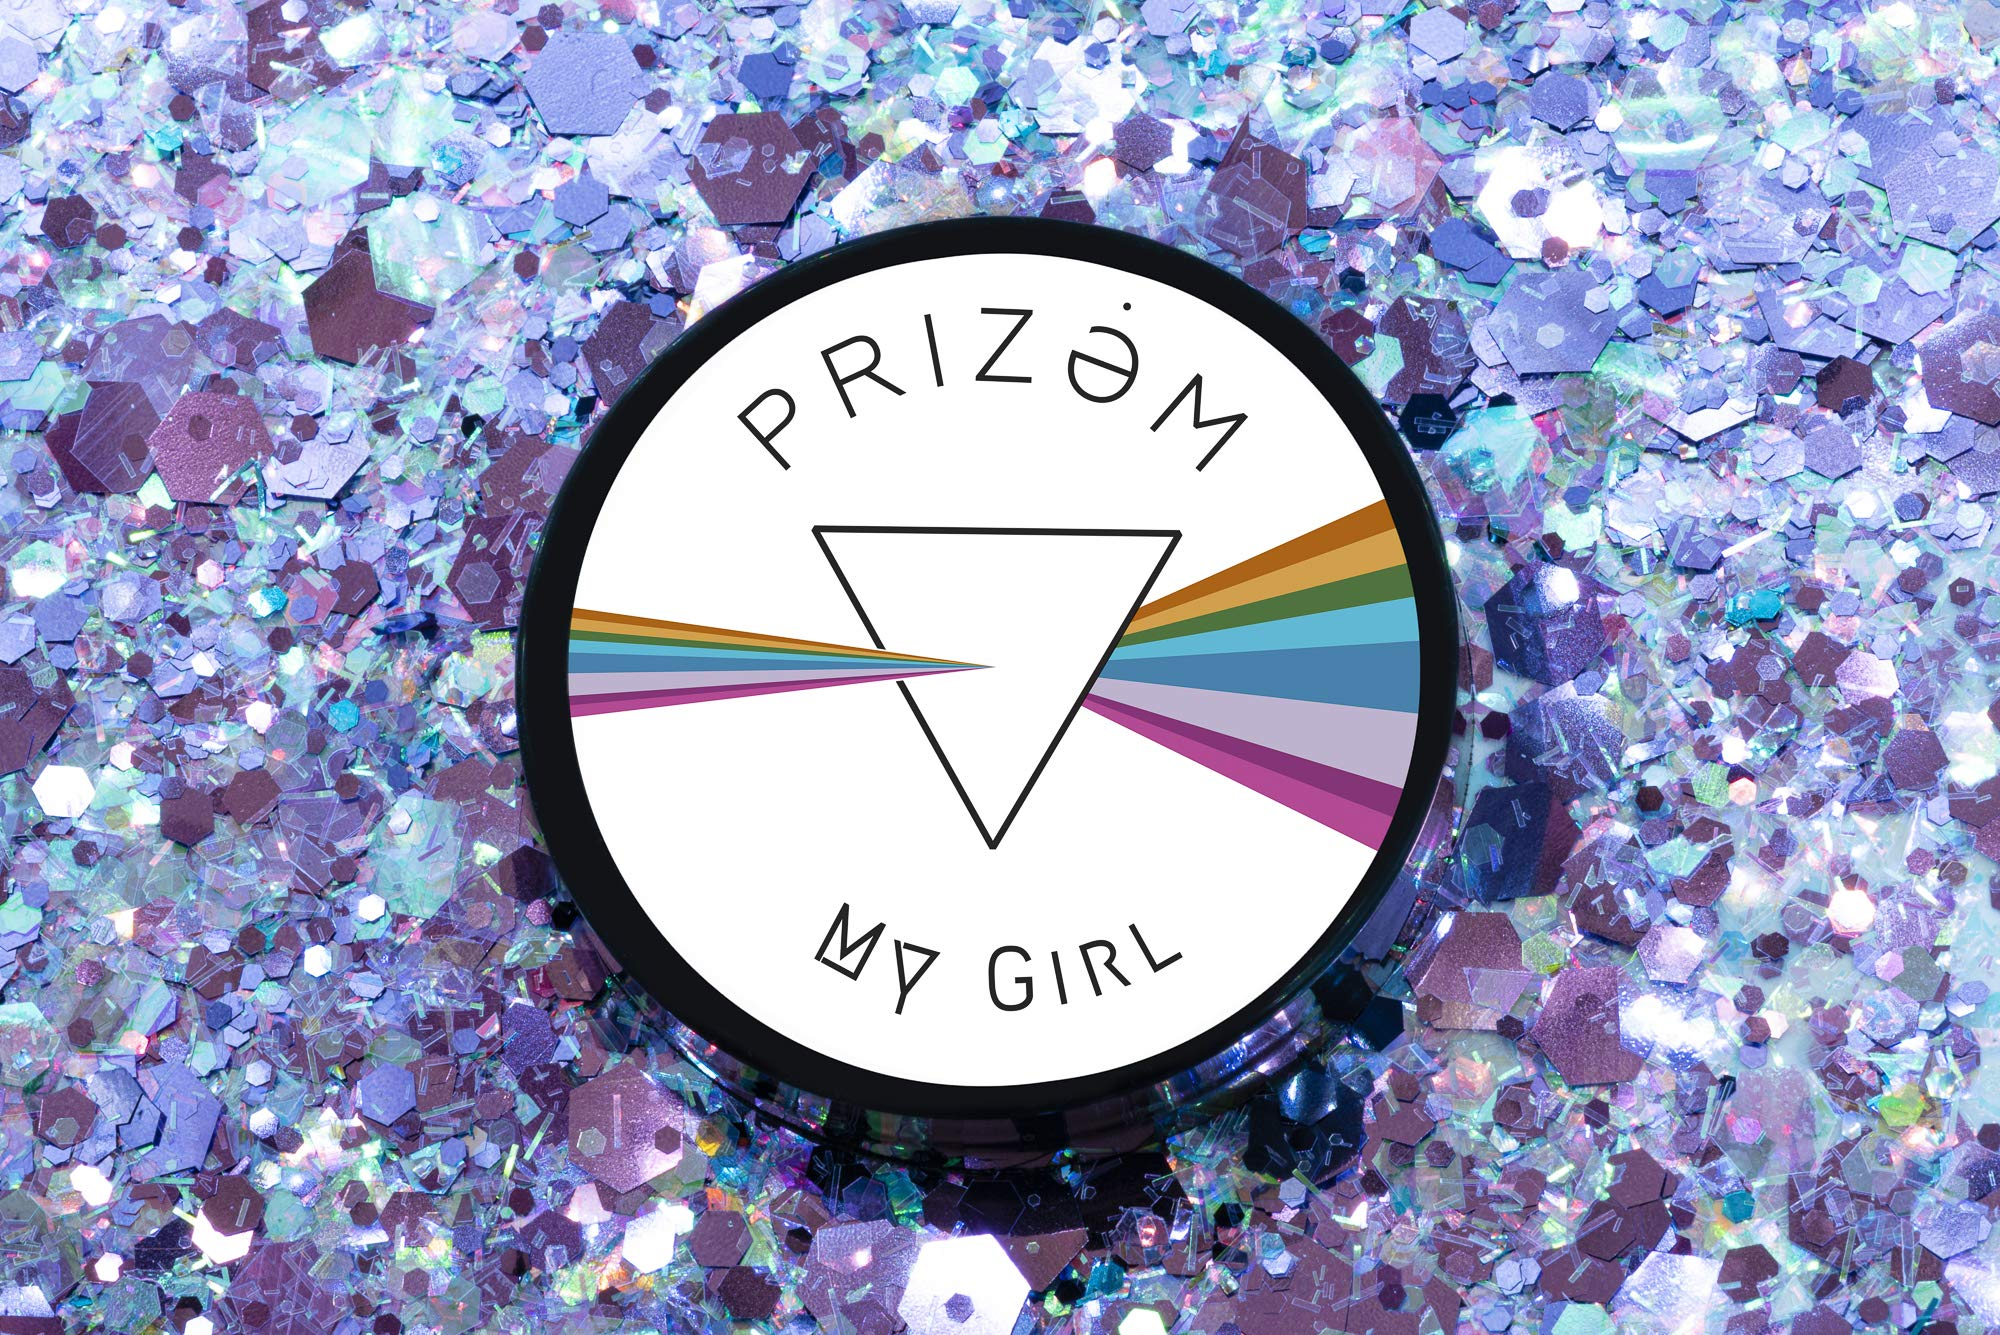 My Girl Glitter ▽ 60g ▽ Festival Glitter, Chunky Glitter, Makeup Glitter, Face Glitter, Body Glitter, Glitter Makeup, Hair Glitter, Cosmetic Glitter, Nail Glitter, Eyeshadow Glitter by Prizem